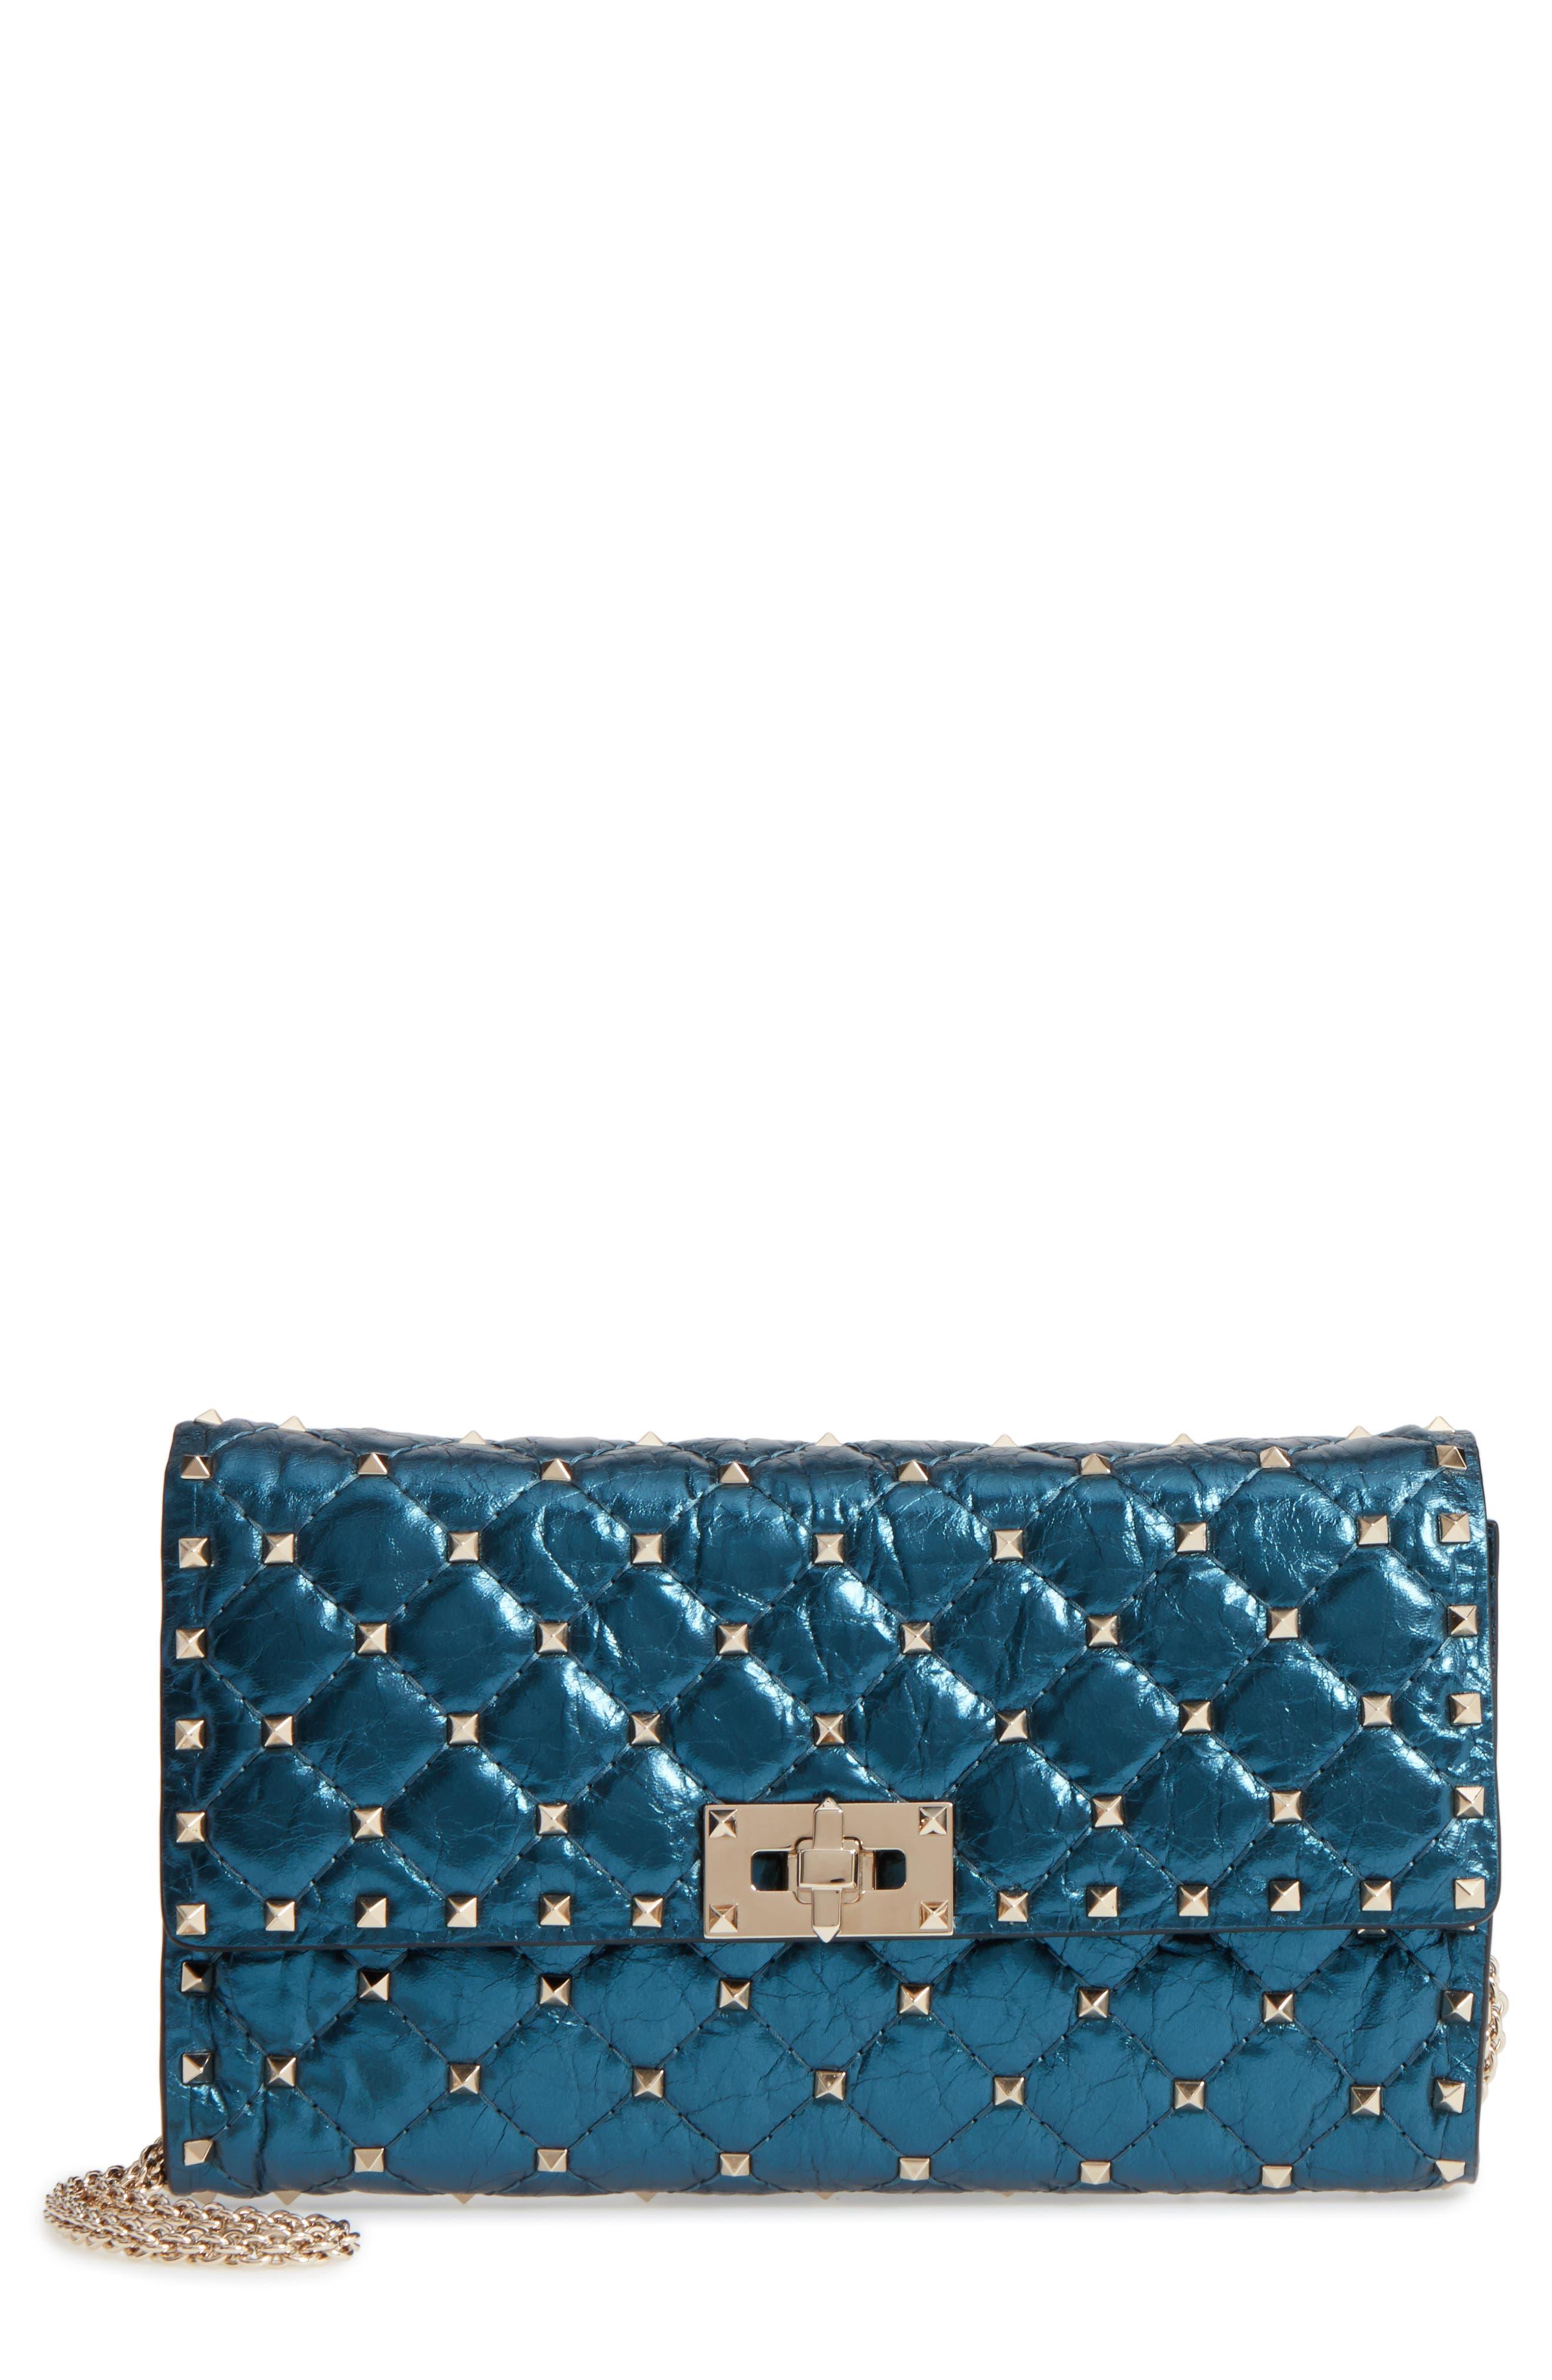 VALENTINO GARAVANI Small Rockstud Spike Laminato Crossbody Bag